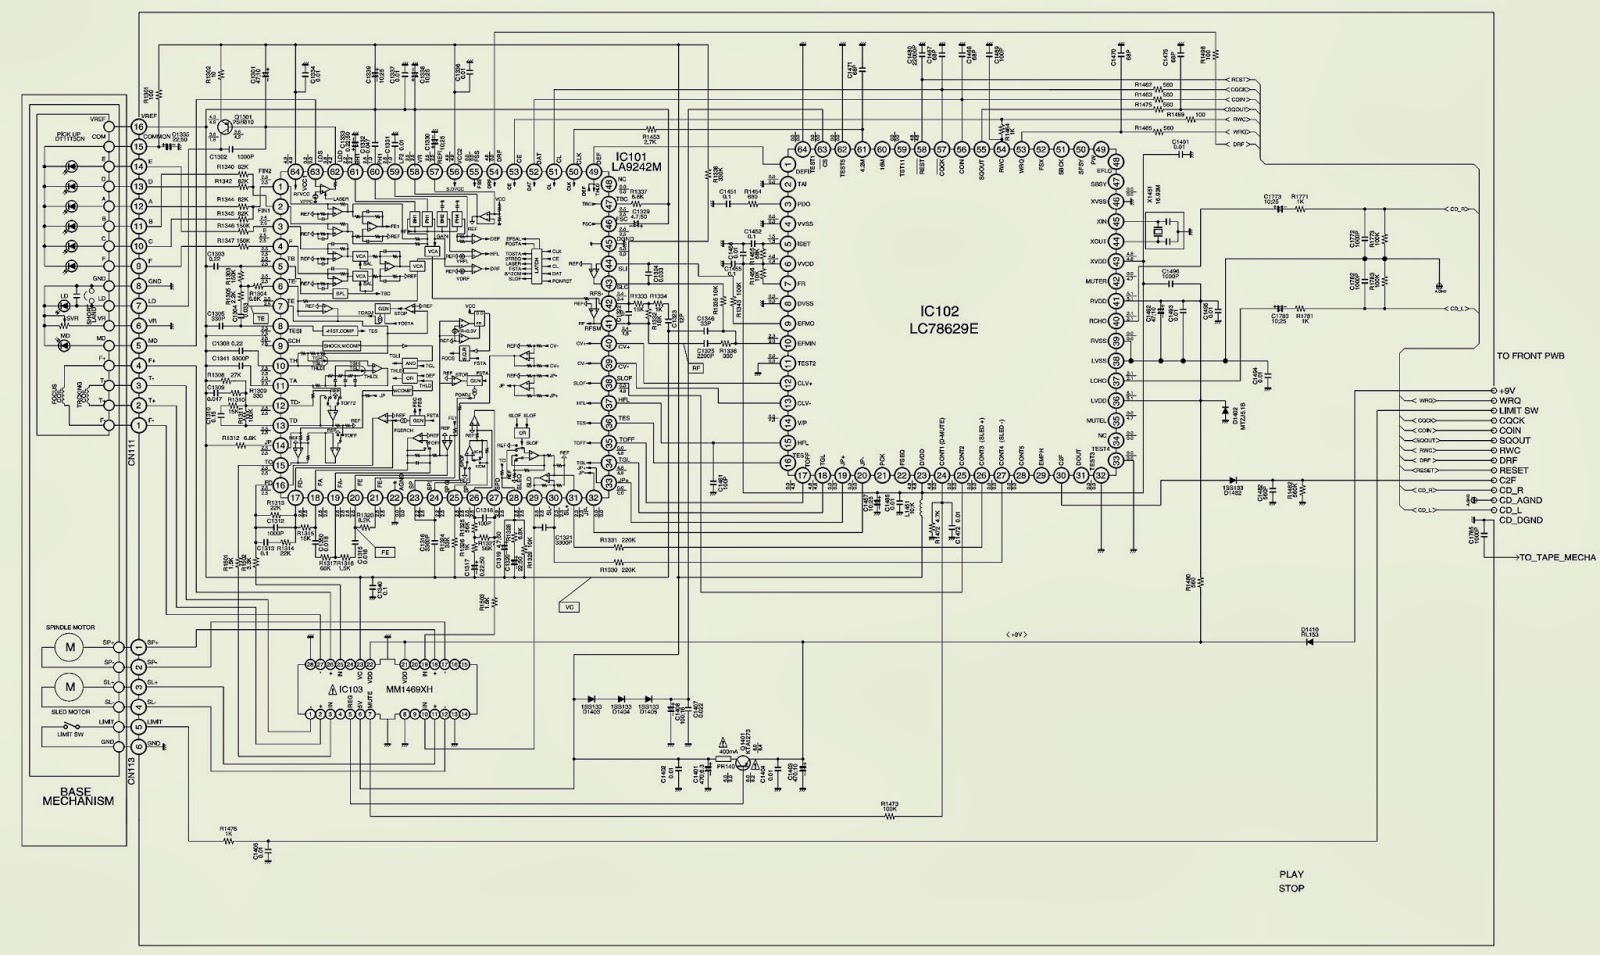 sanyo schematic diagram sanyo tv schematic diagram